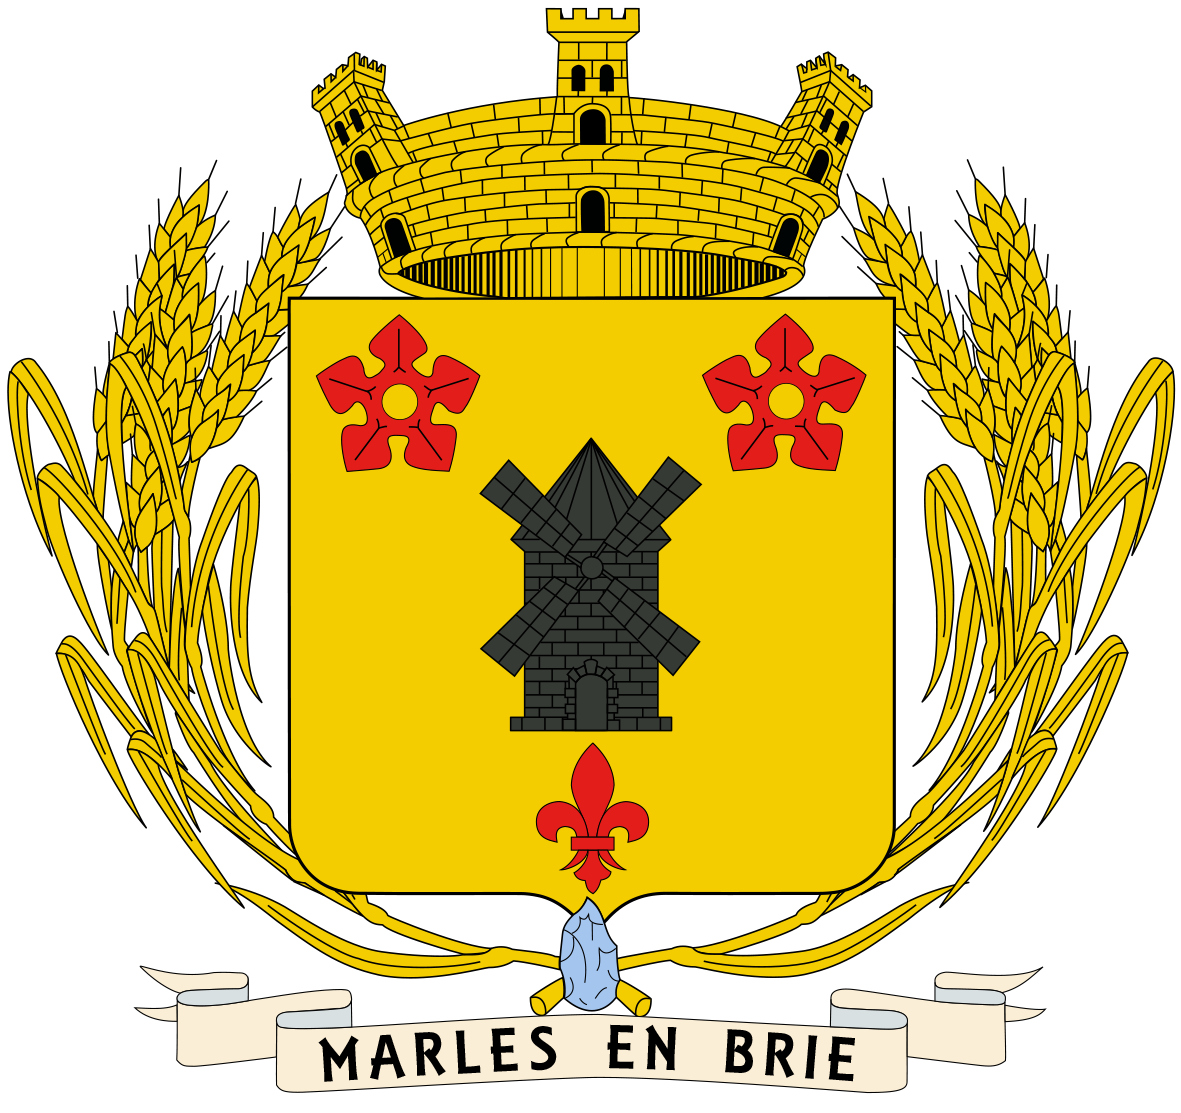 Commune de Marles-en-Brie